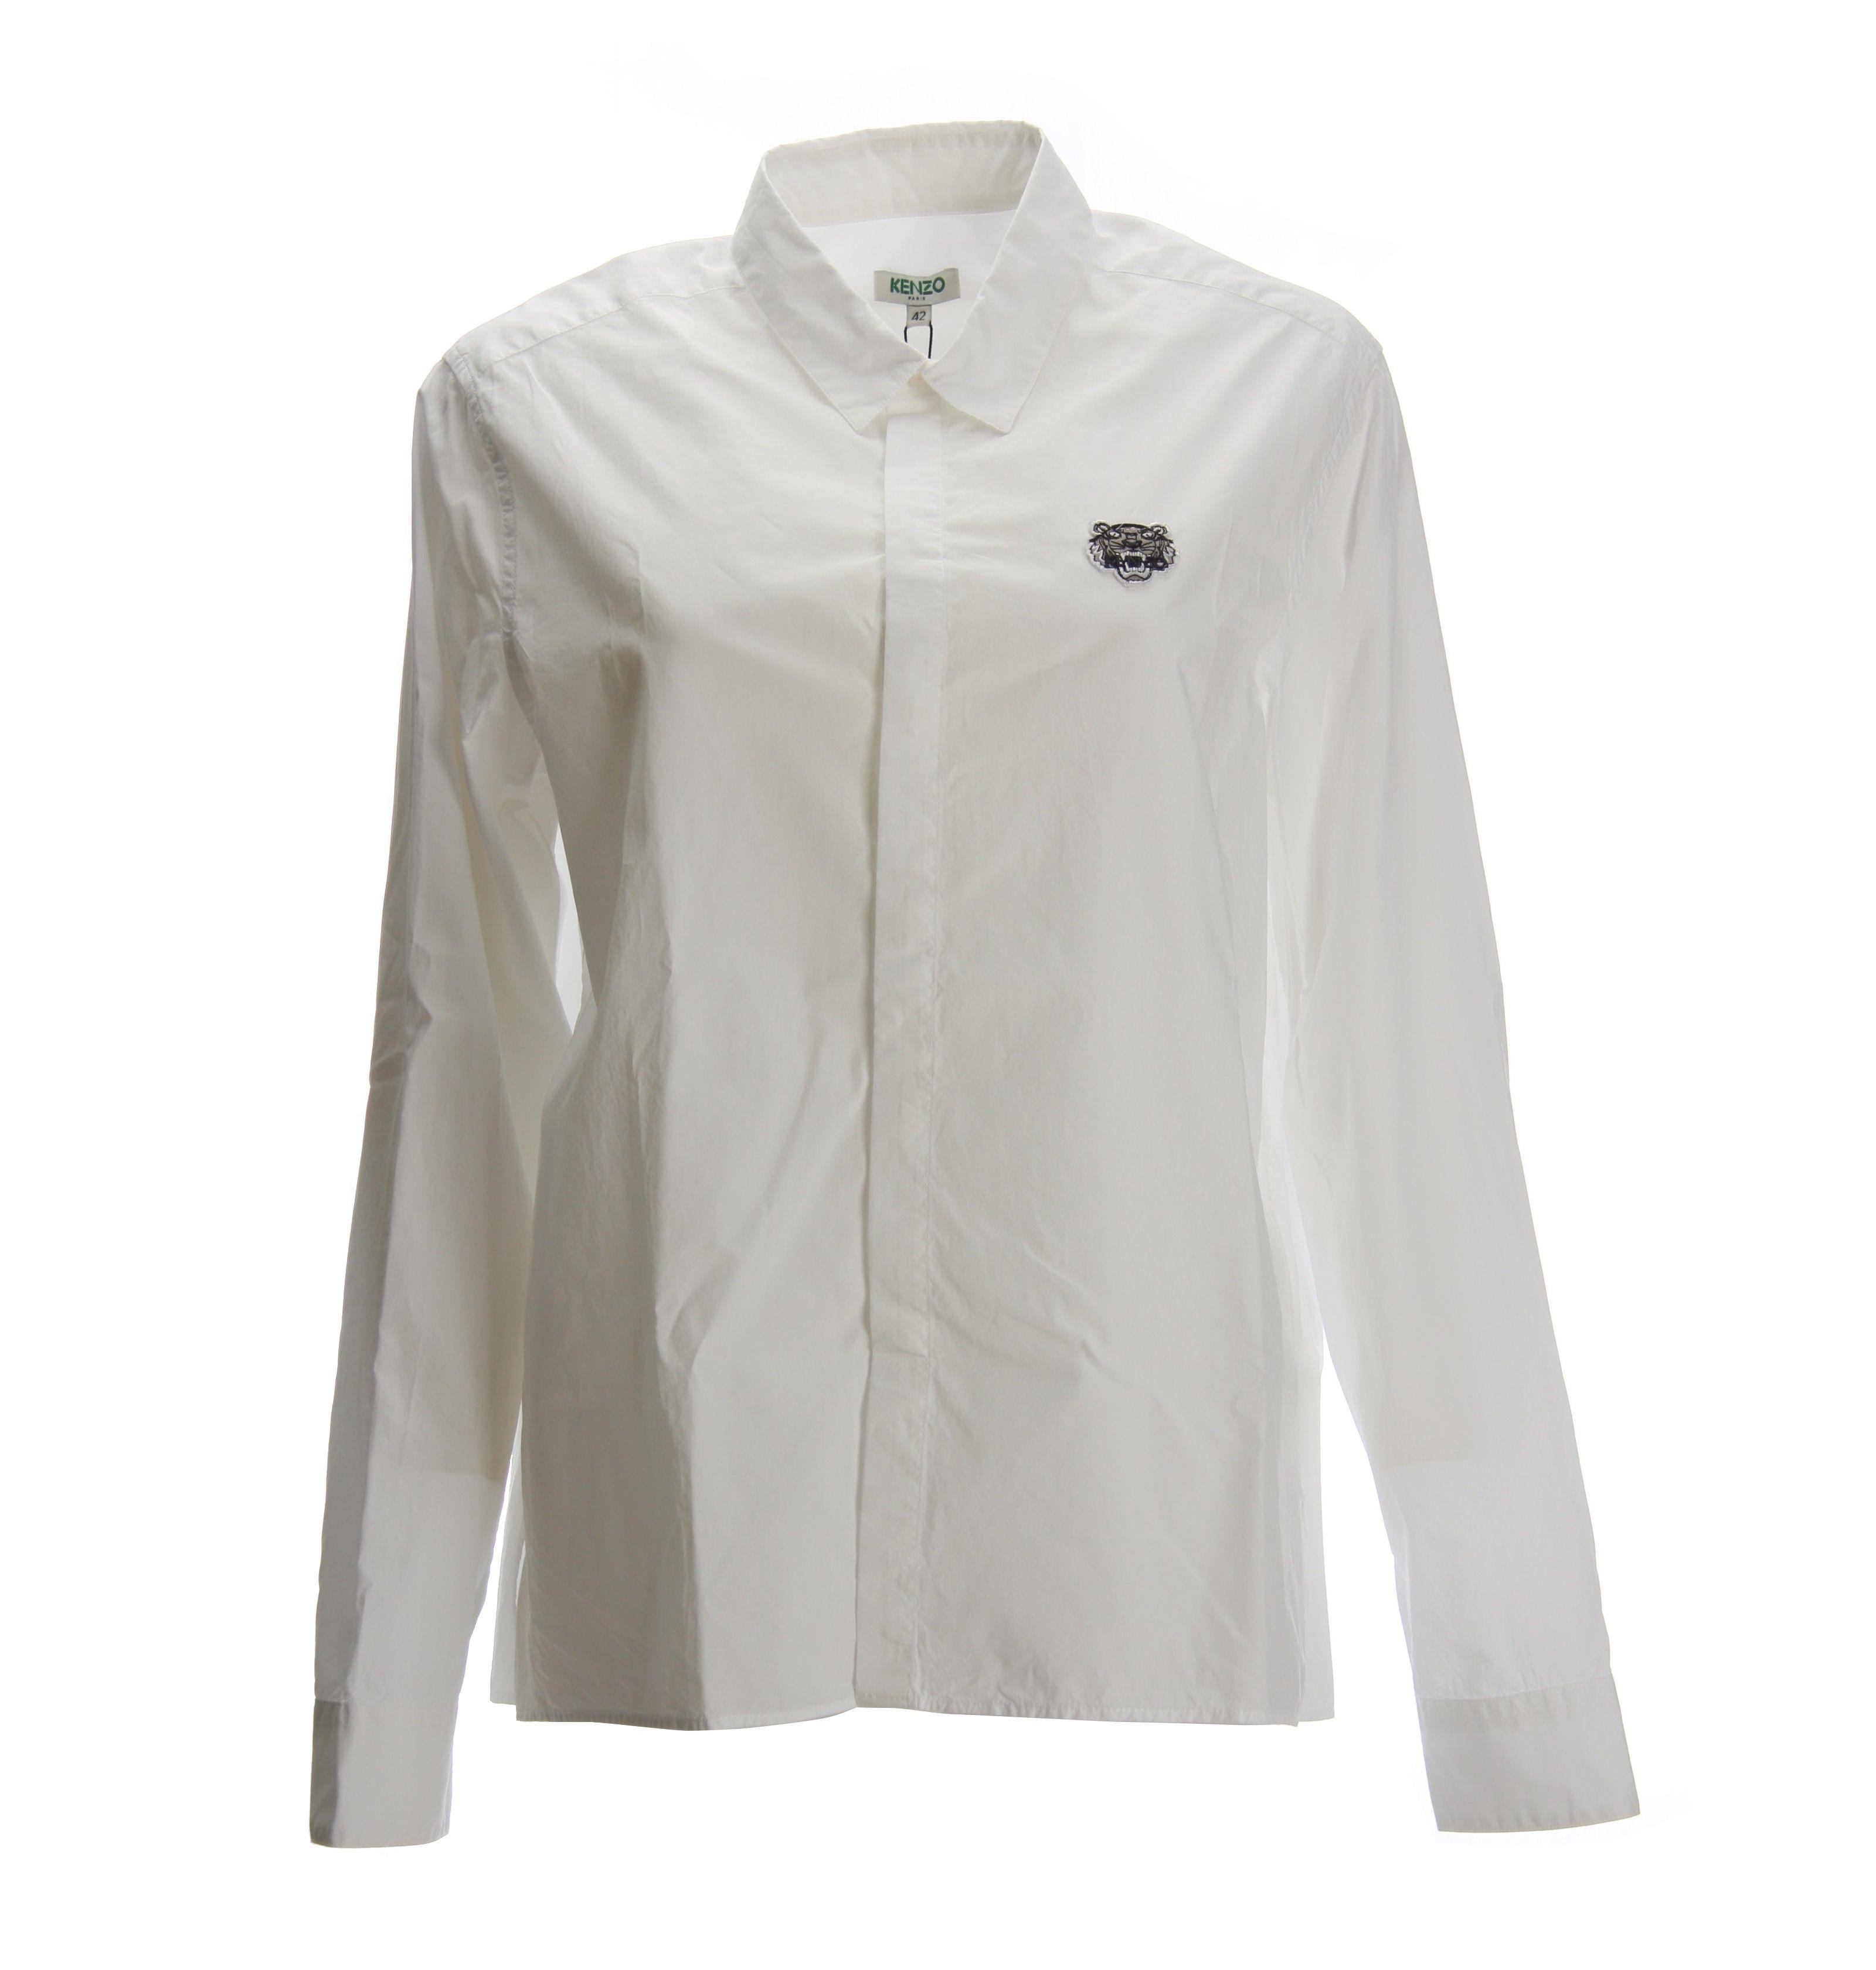 Kenzo White Tiger Logo Shirt